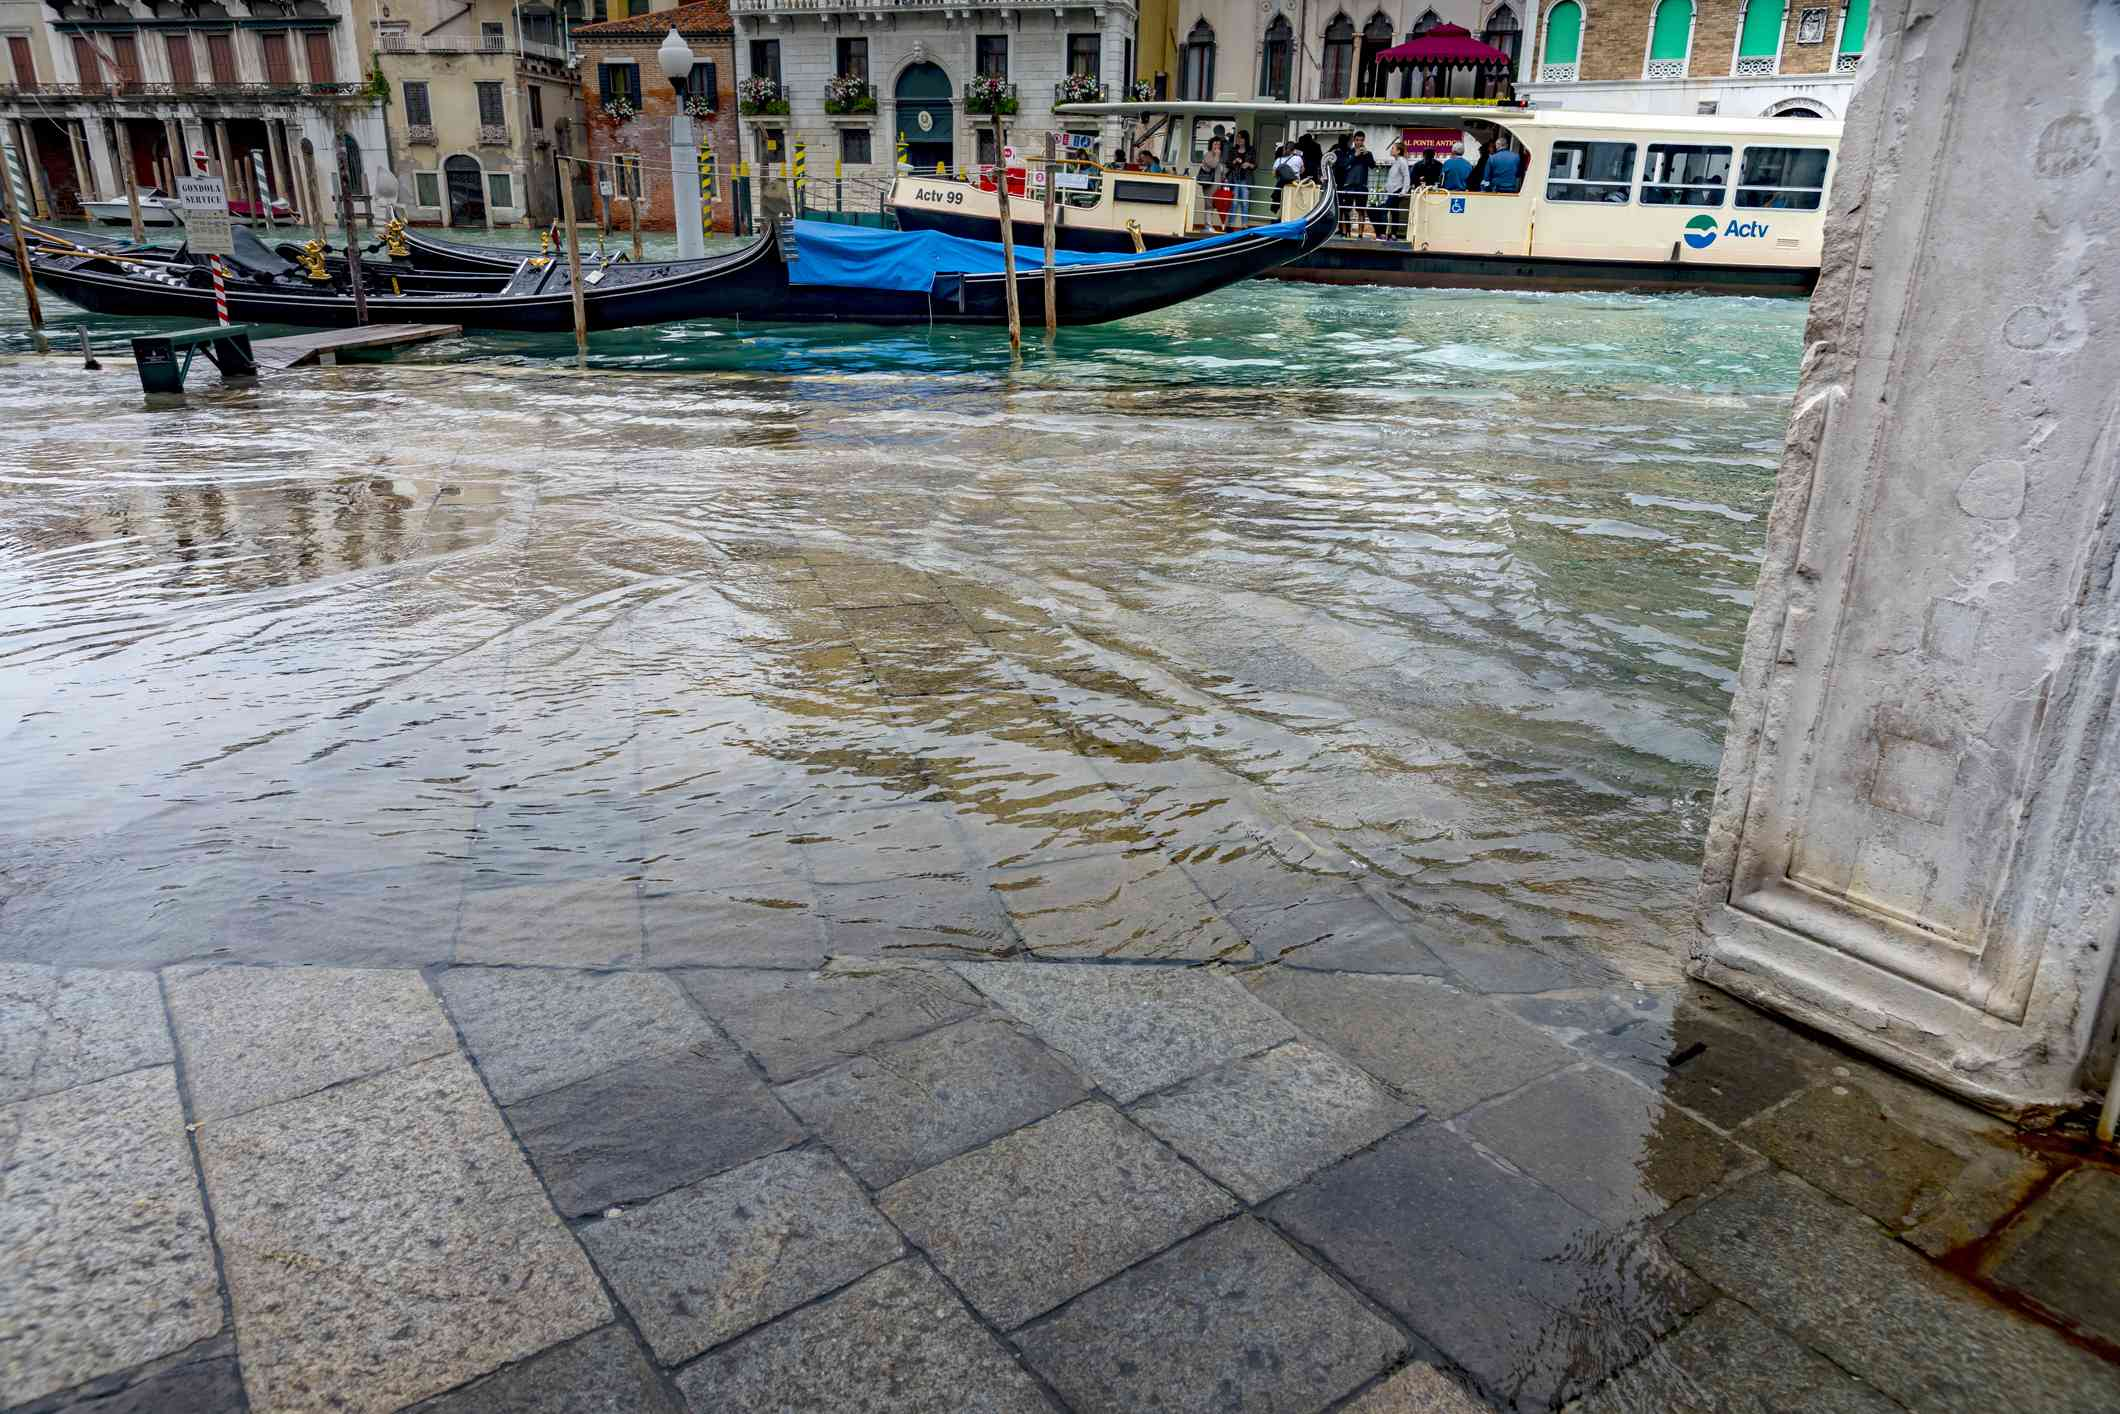 Flooding under the Rialto Bridge